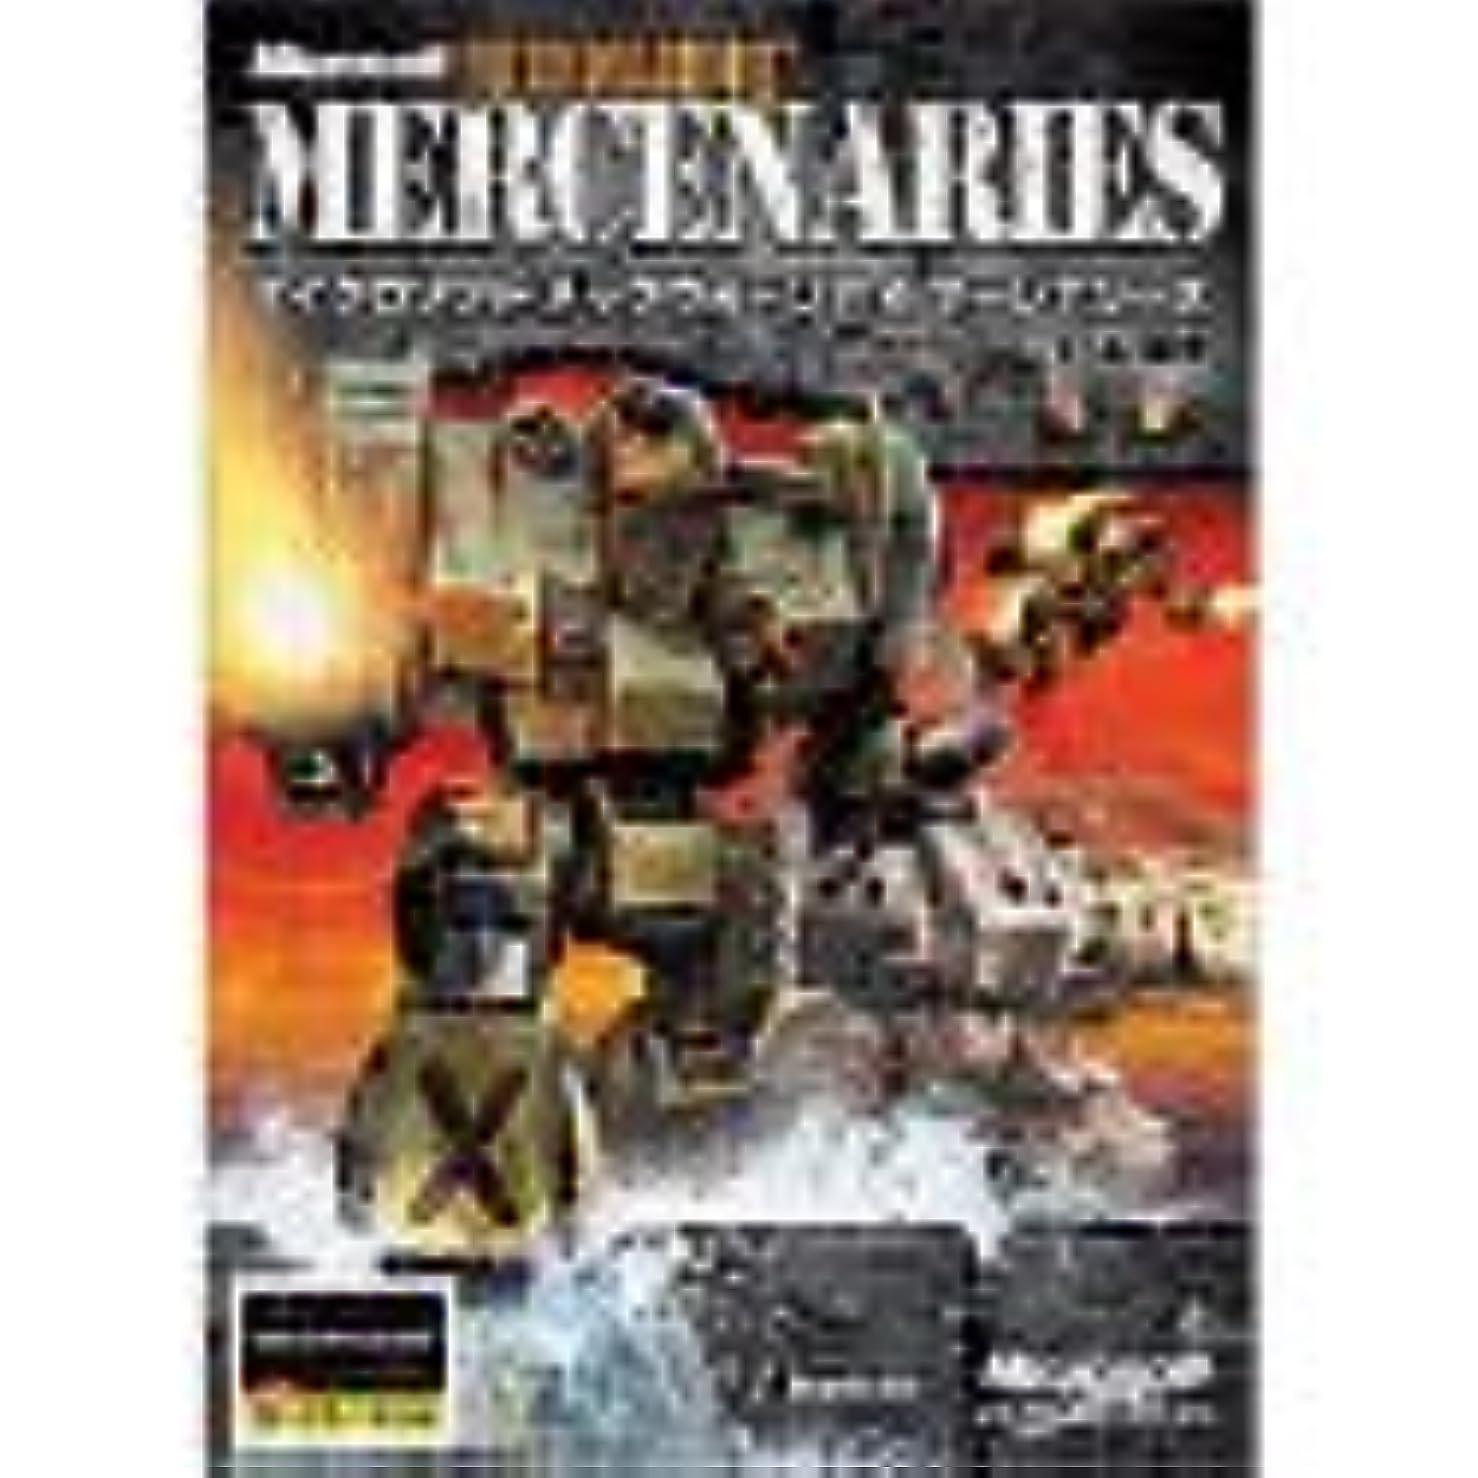 一晩可能性エキスMicrosoft Mech Warrior 4 Mercenaries 日本語版